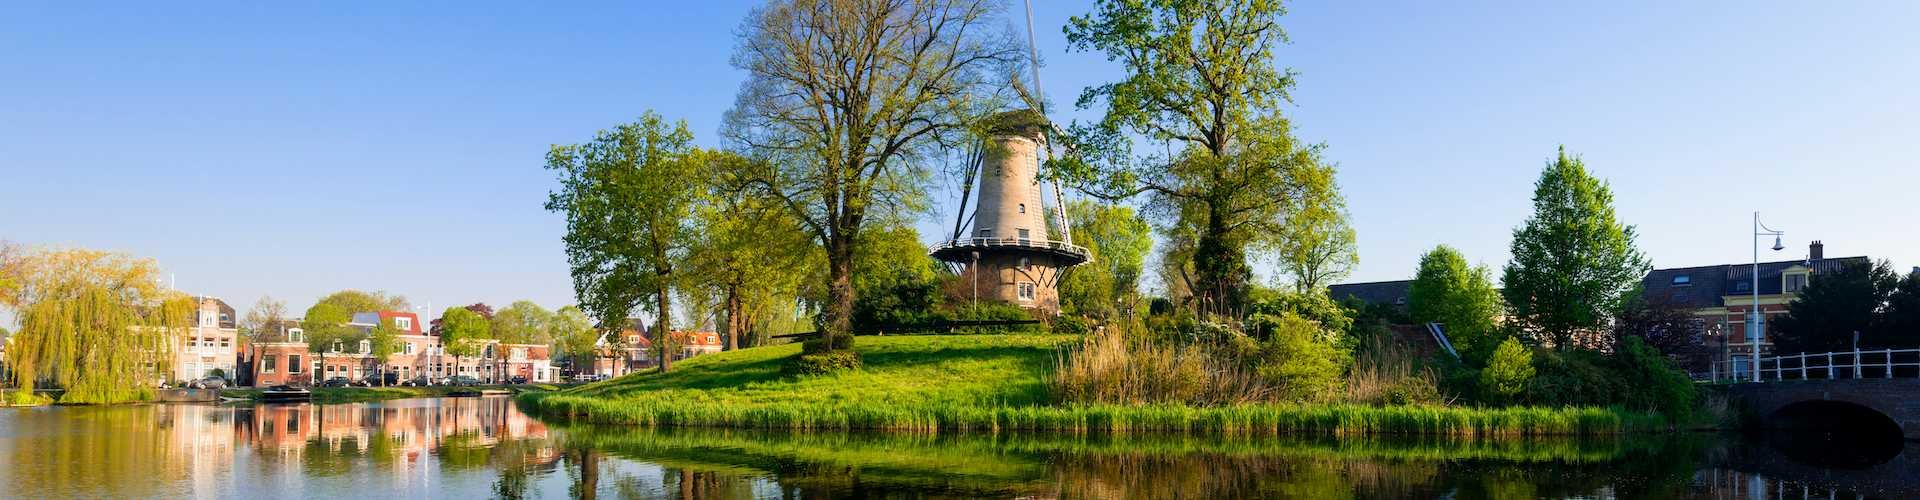 Familienurlaub in Noord-Holland